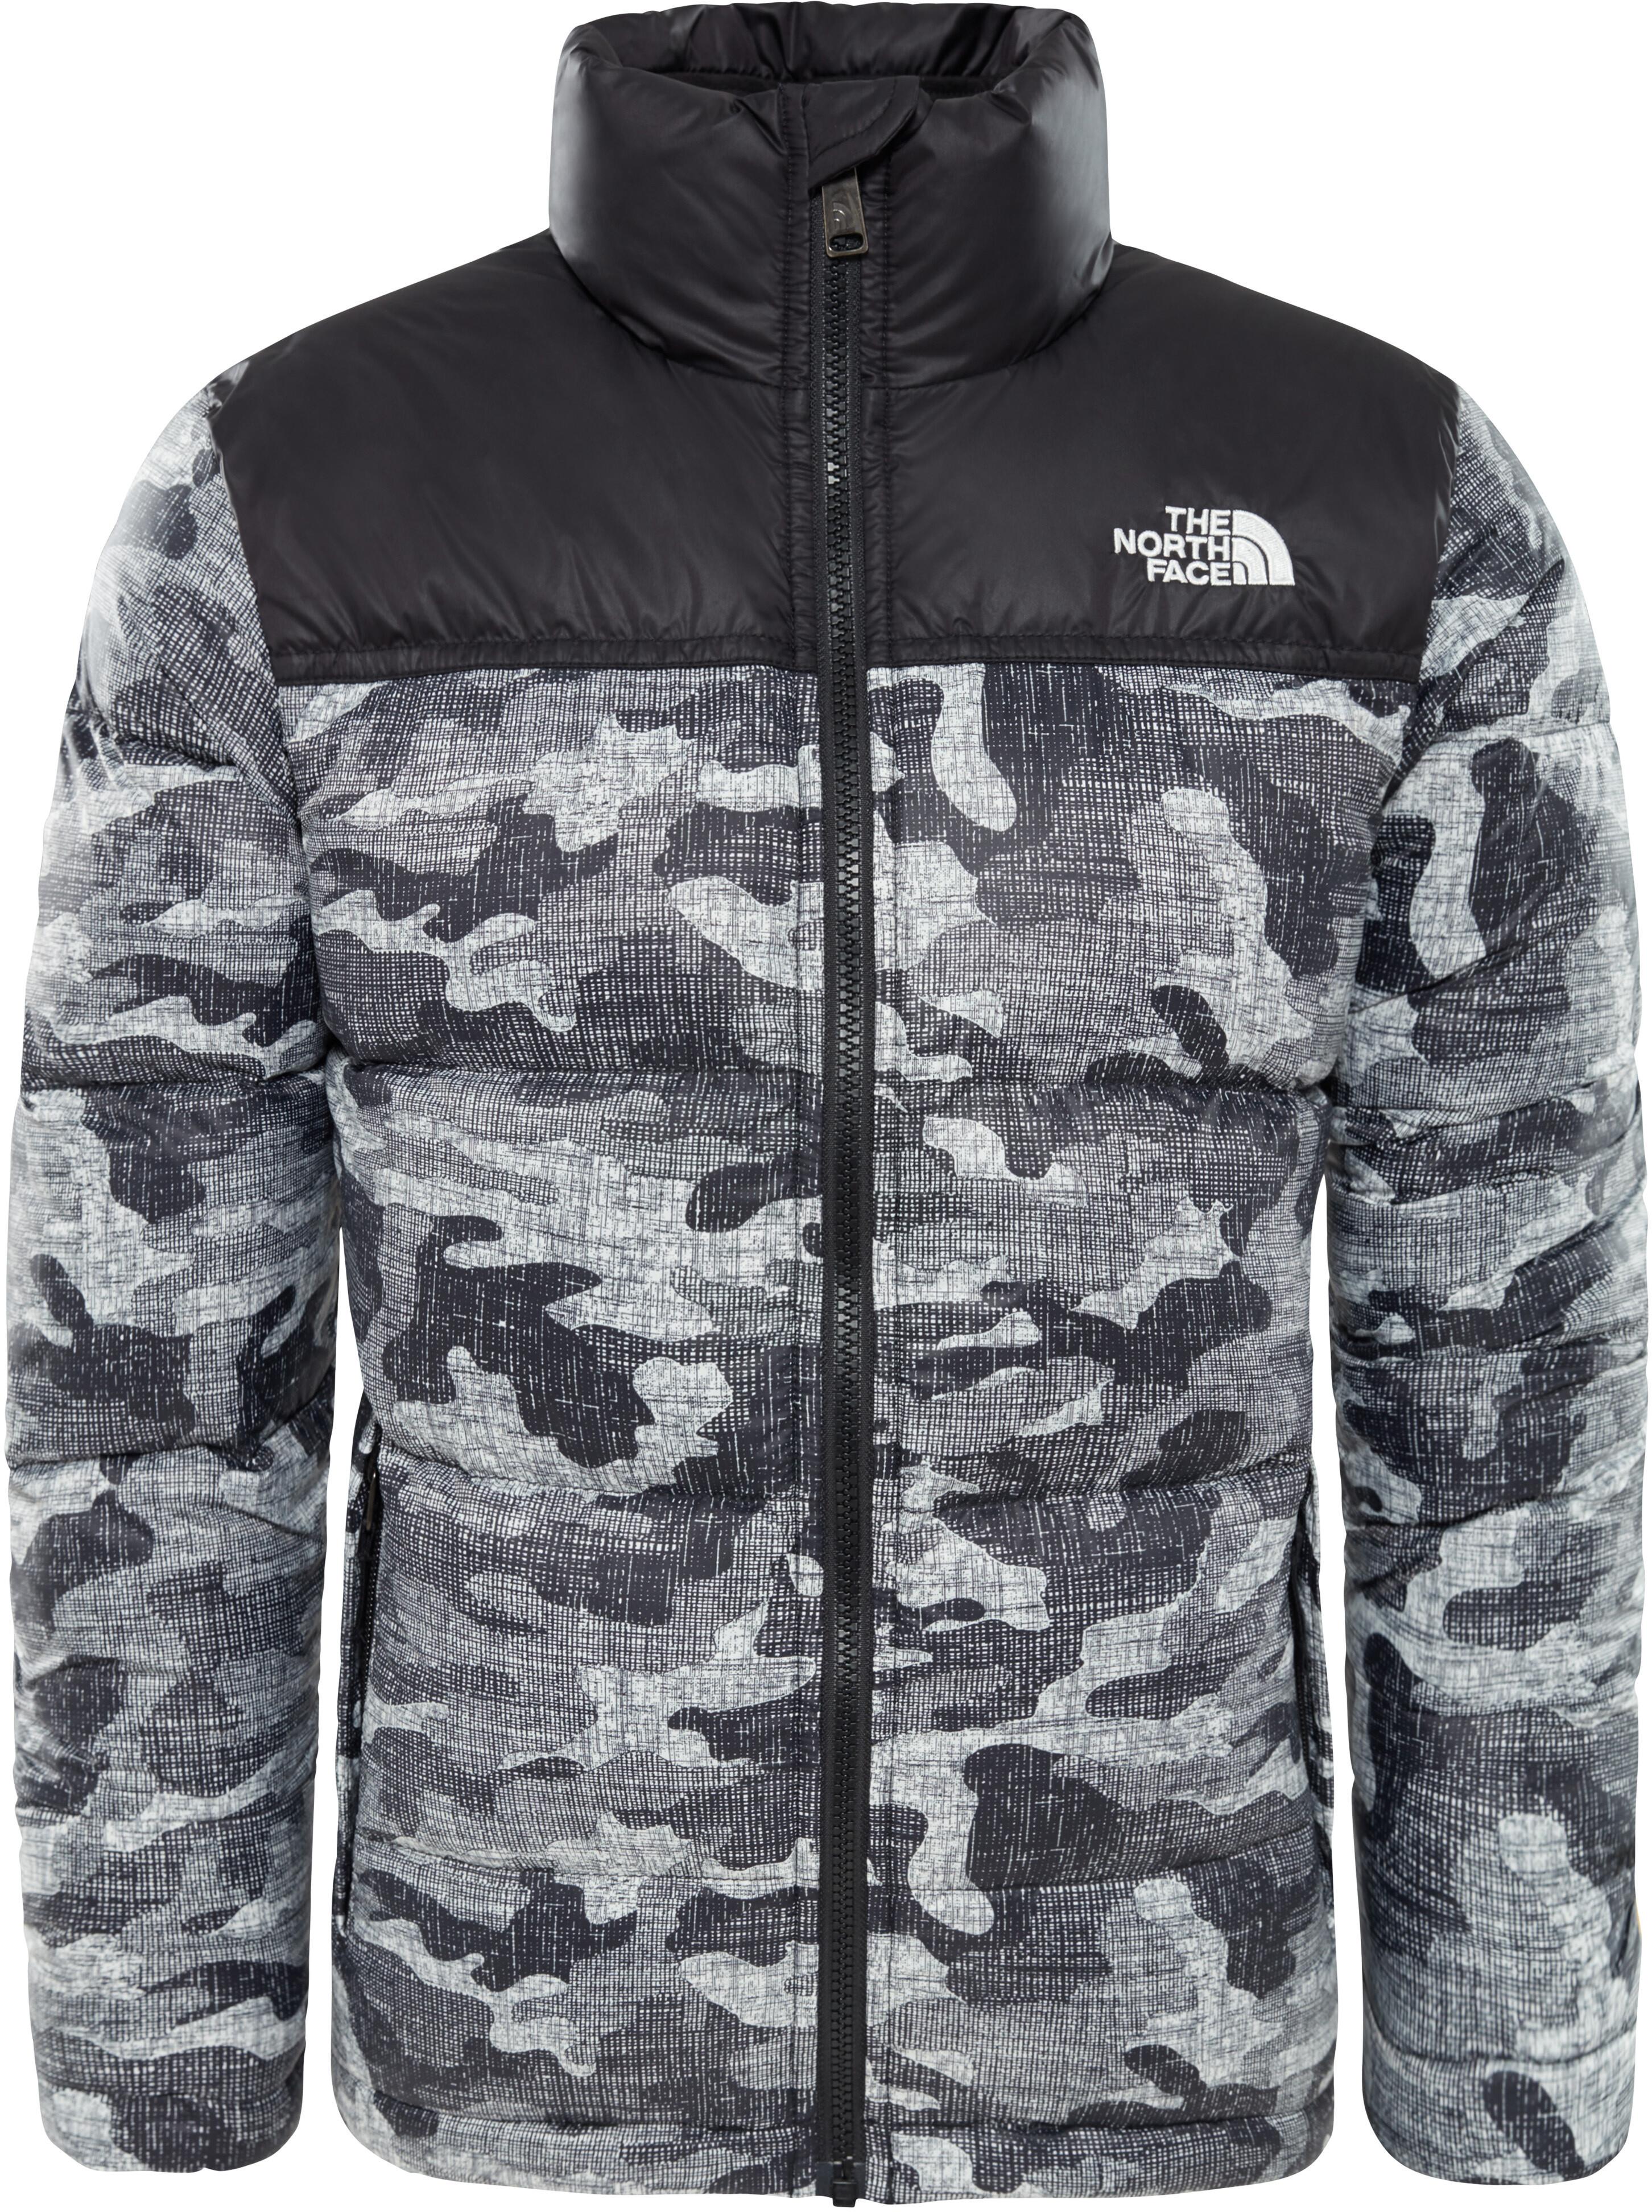 898236b89 The North Face Nuptse Down Jacket Boys tnf black textured camo print